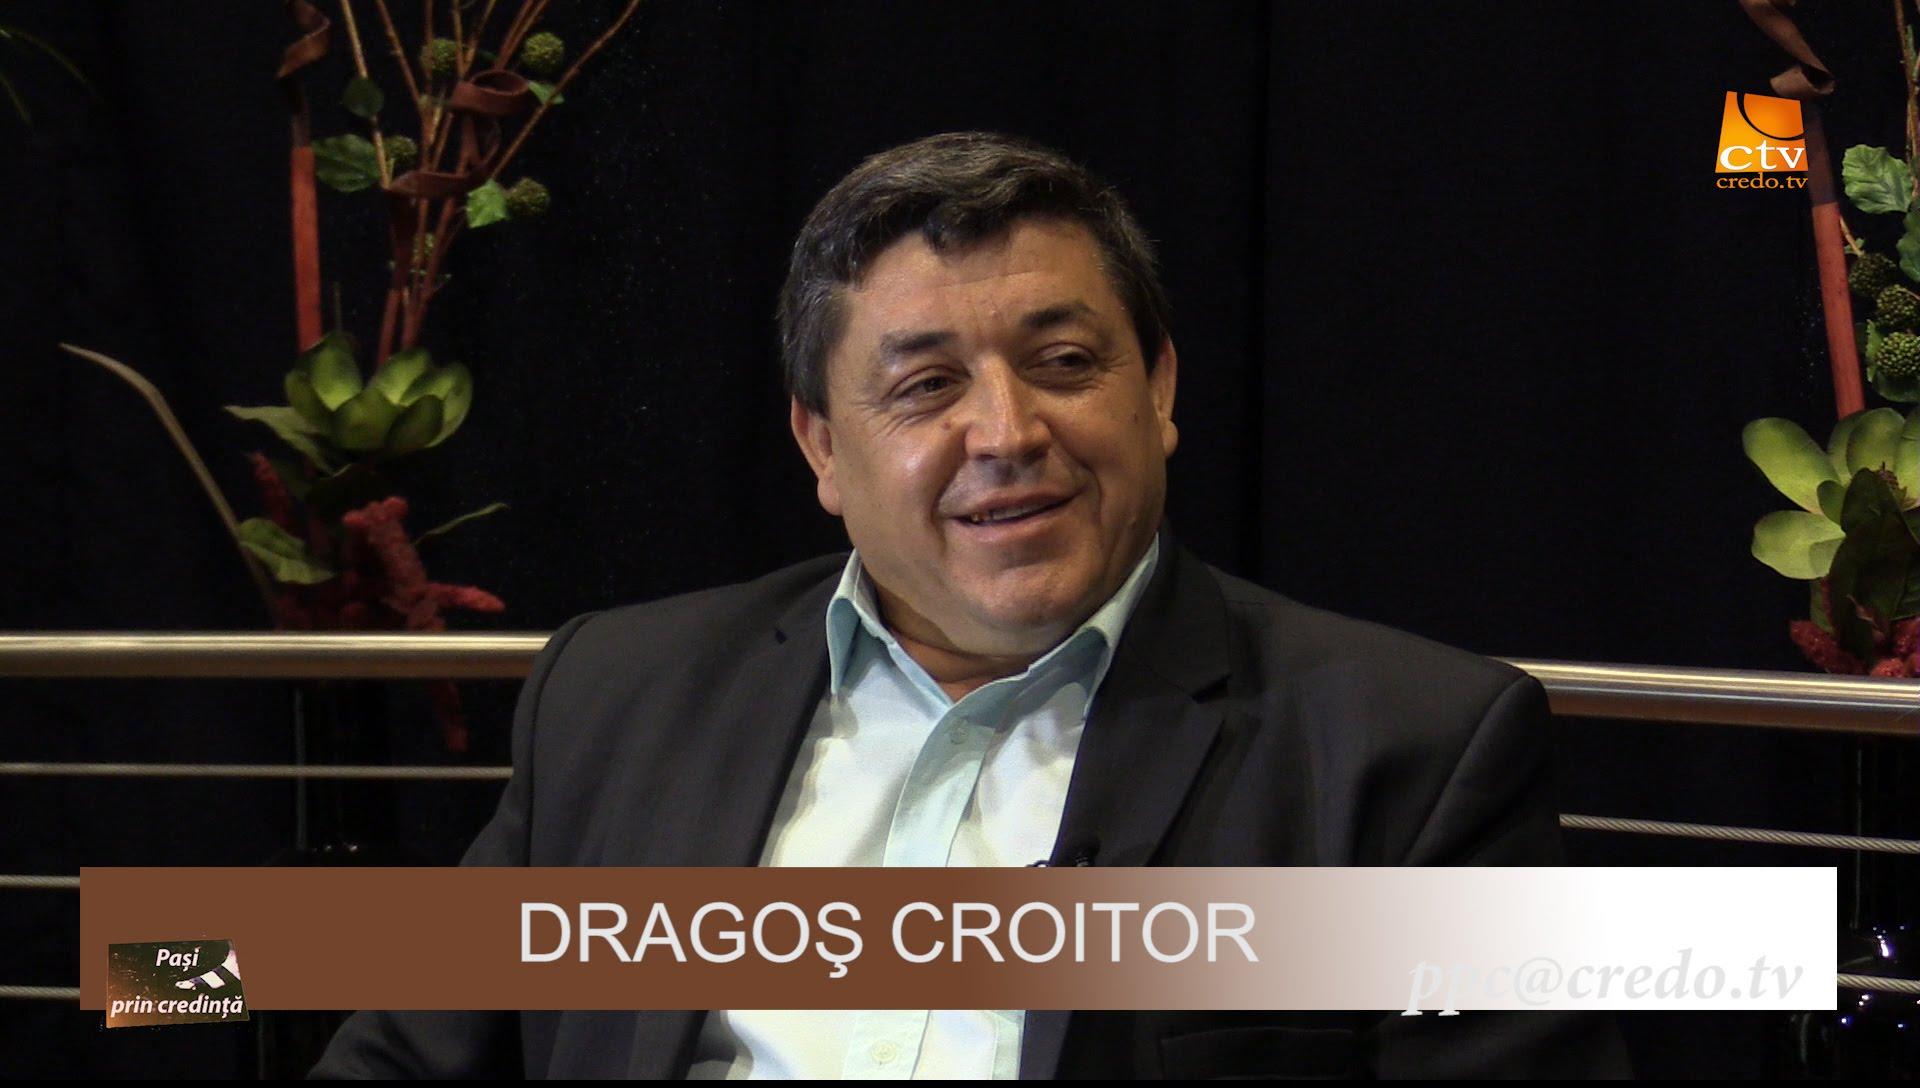 Dragos Croitoru – In fata lui Dumnezeu conteaza ca esti bogat sau sarac pe pamant?